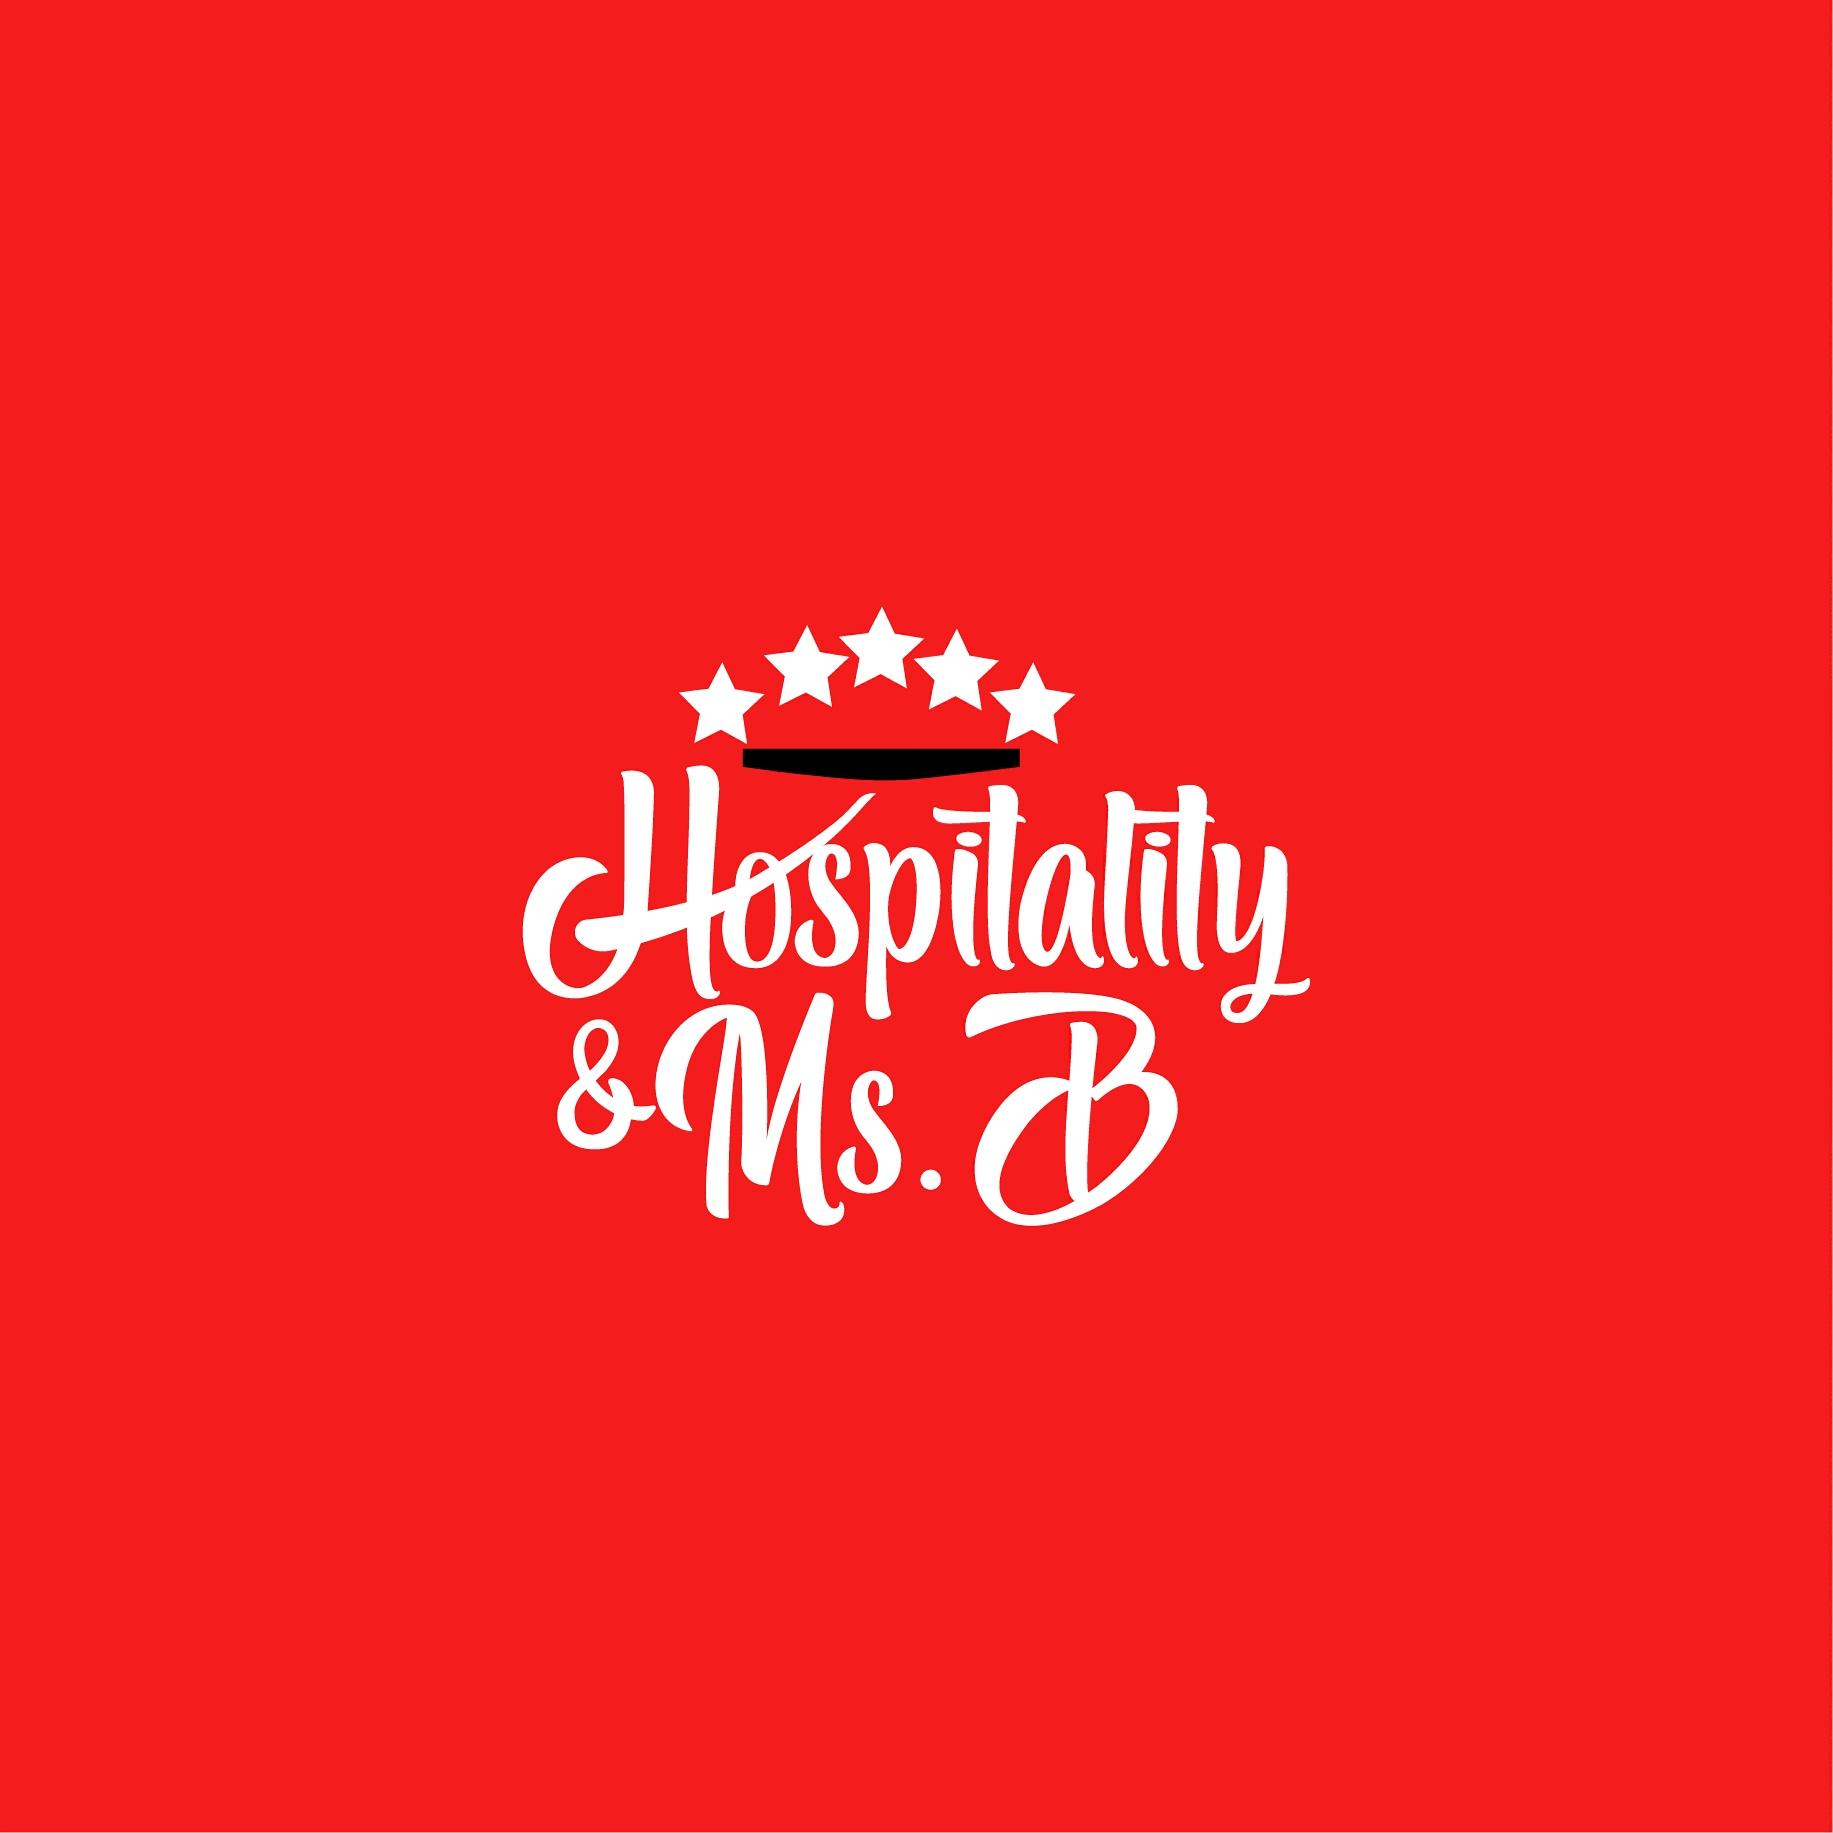 Lauretta T-Bickersteth, Hospitalityandmsb